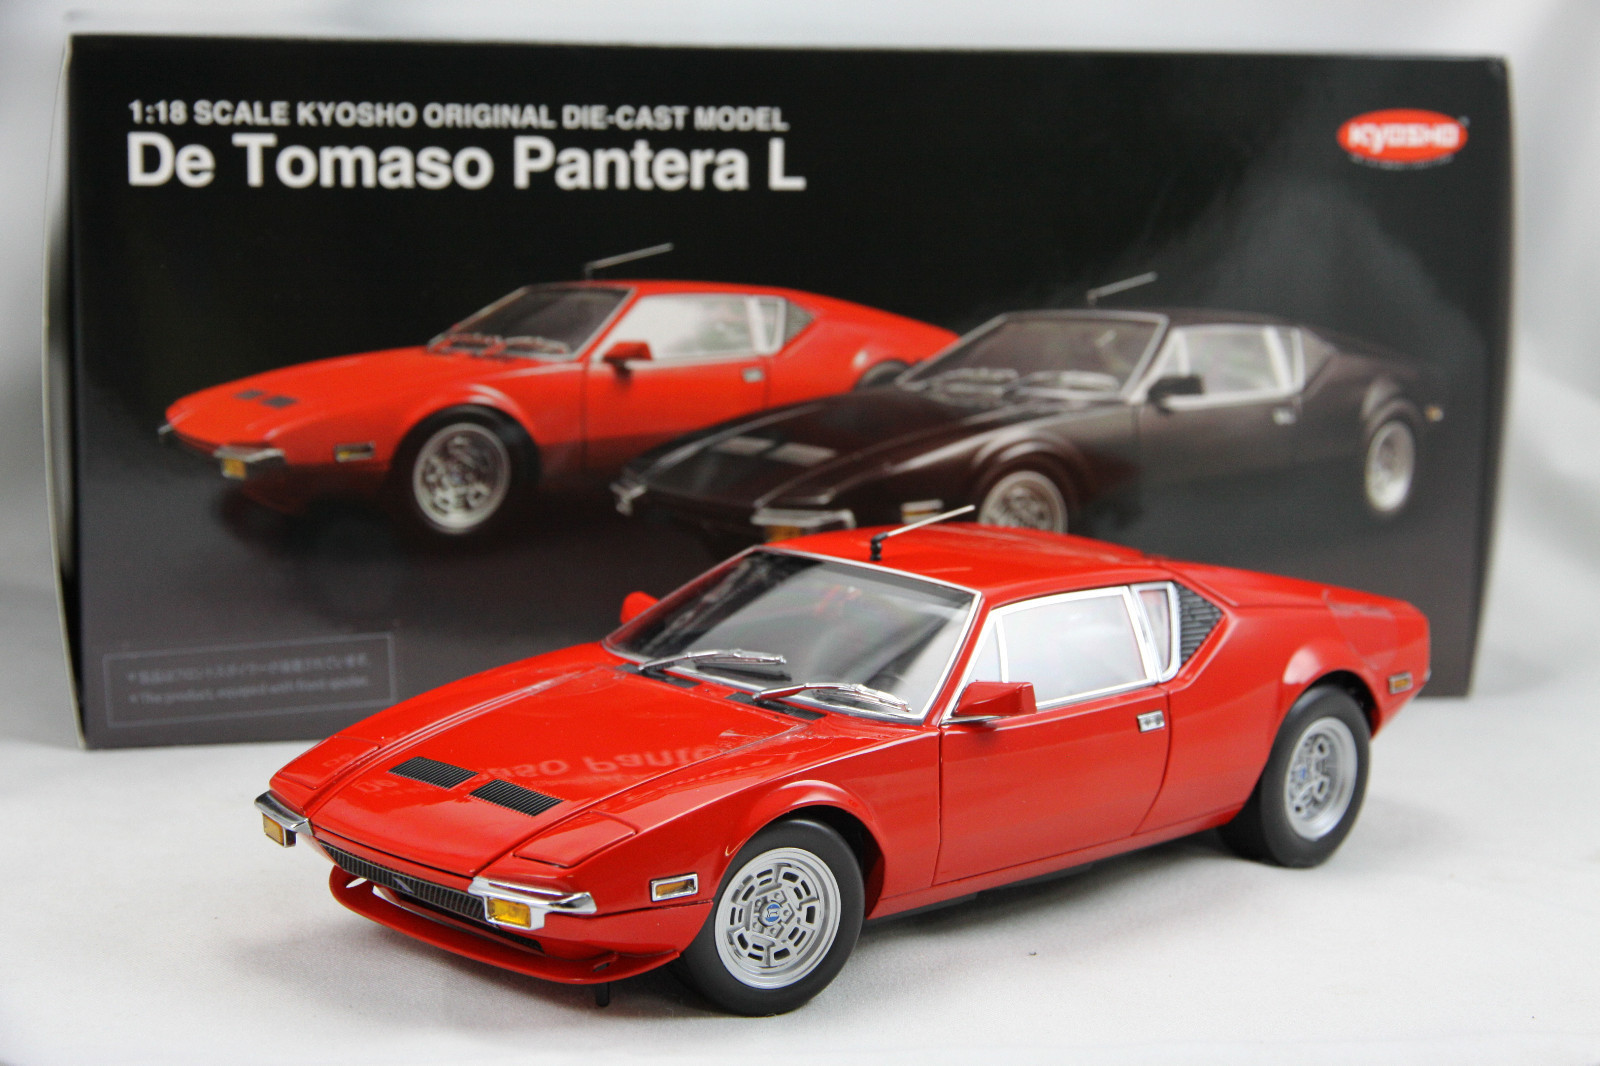 Diecast Model Cars >> De Tomaso Pantera Revived by Gorgeous Scale Model - autoevolution